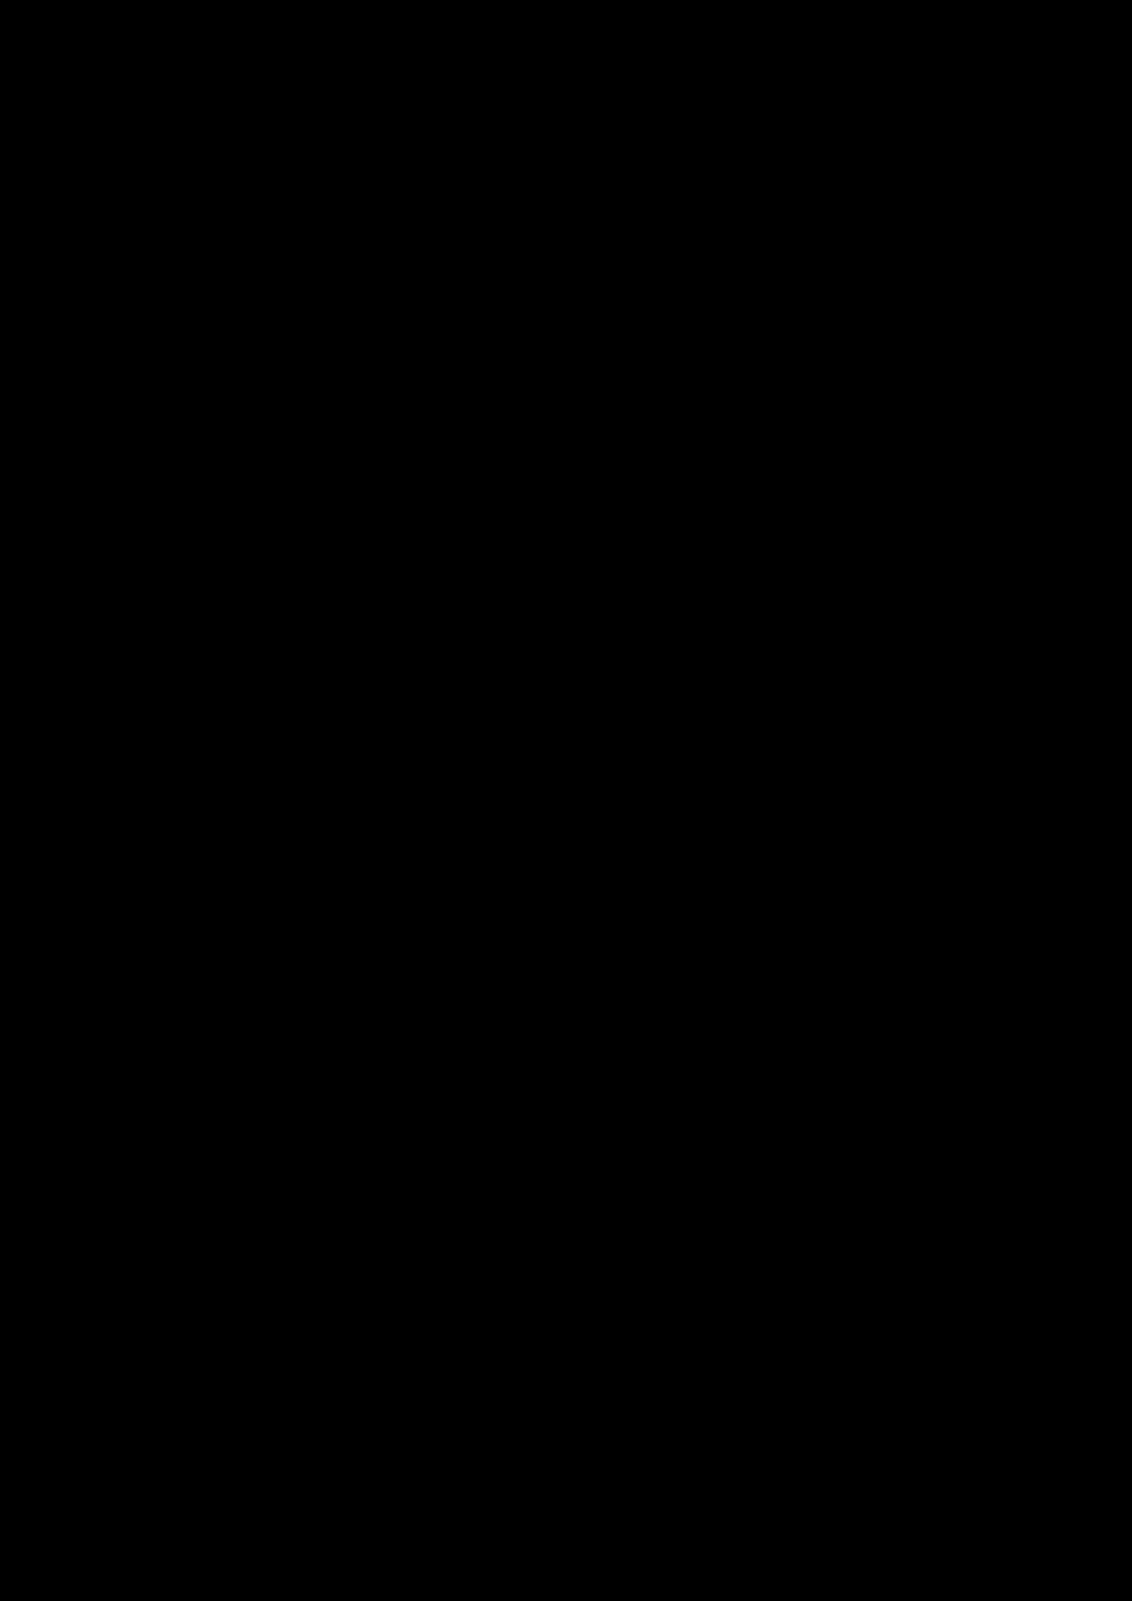 18 berez slide, Image 10